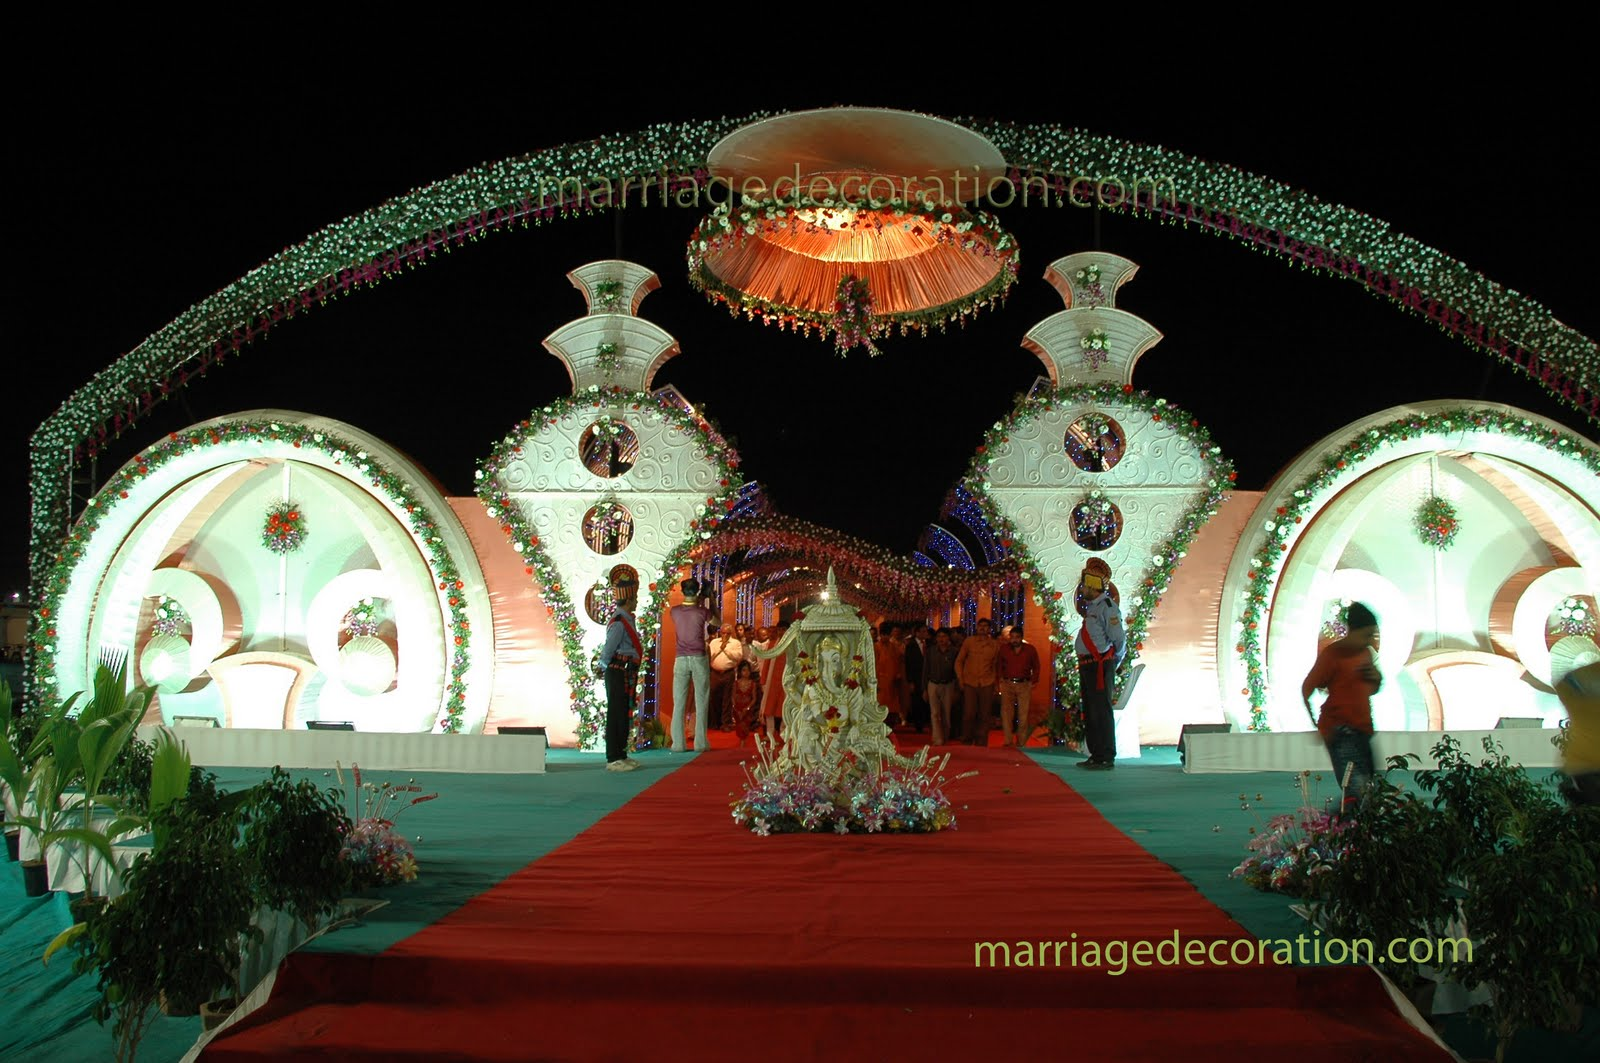 Free Wedding Decorating Idea, Wedding Reception Decorations, Wedding ...